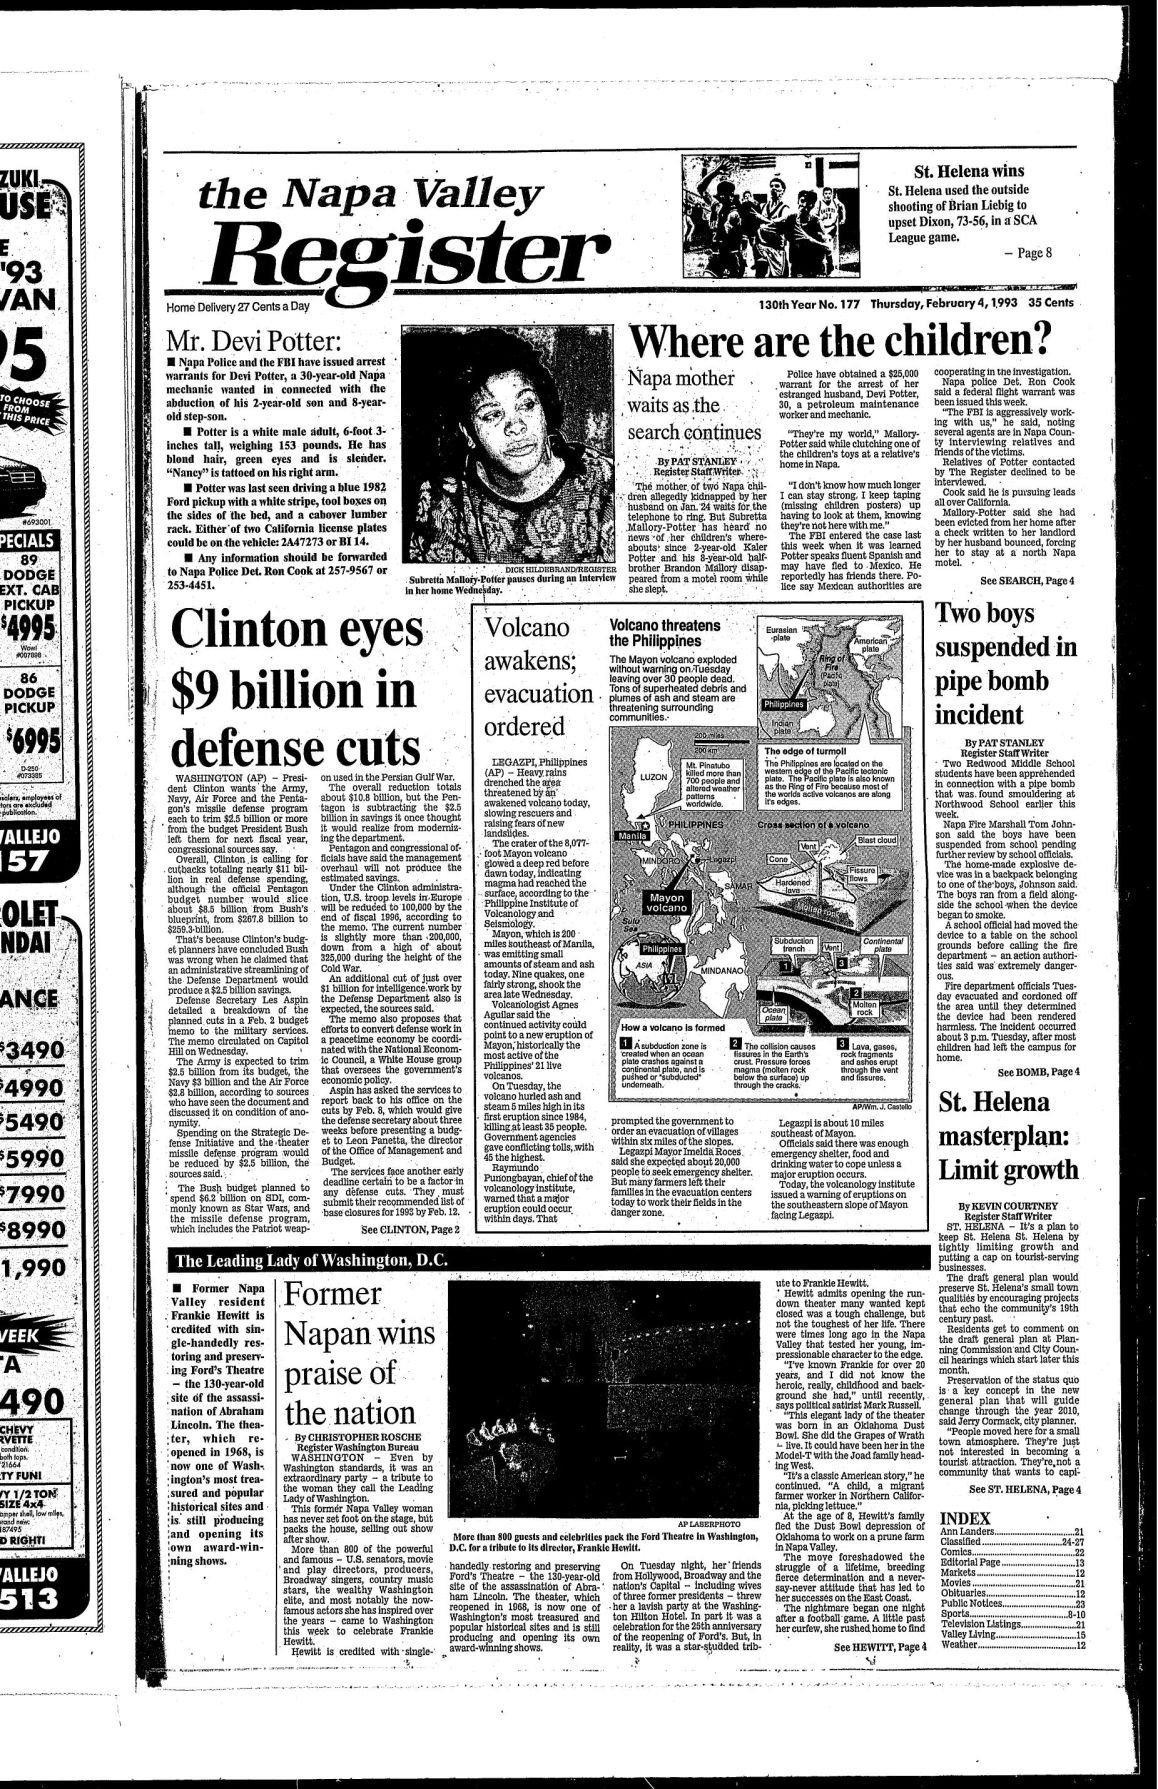 Feb. 4, 1993